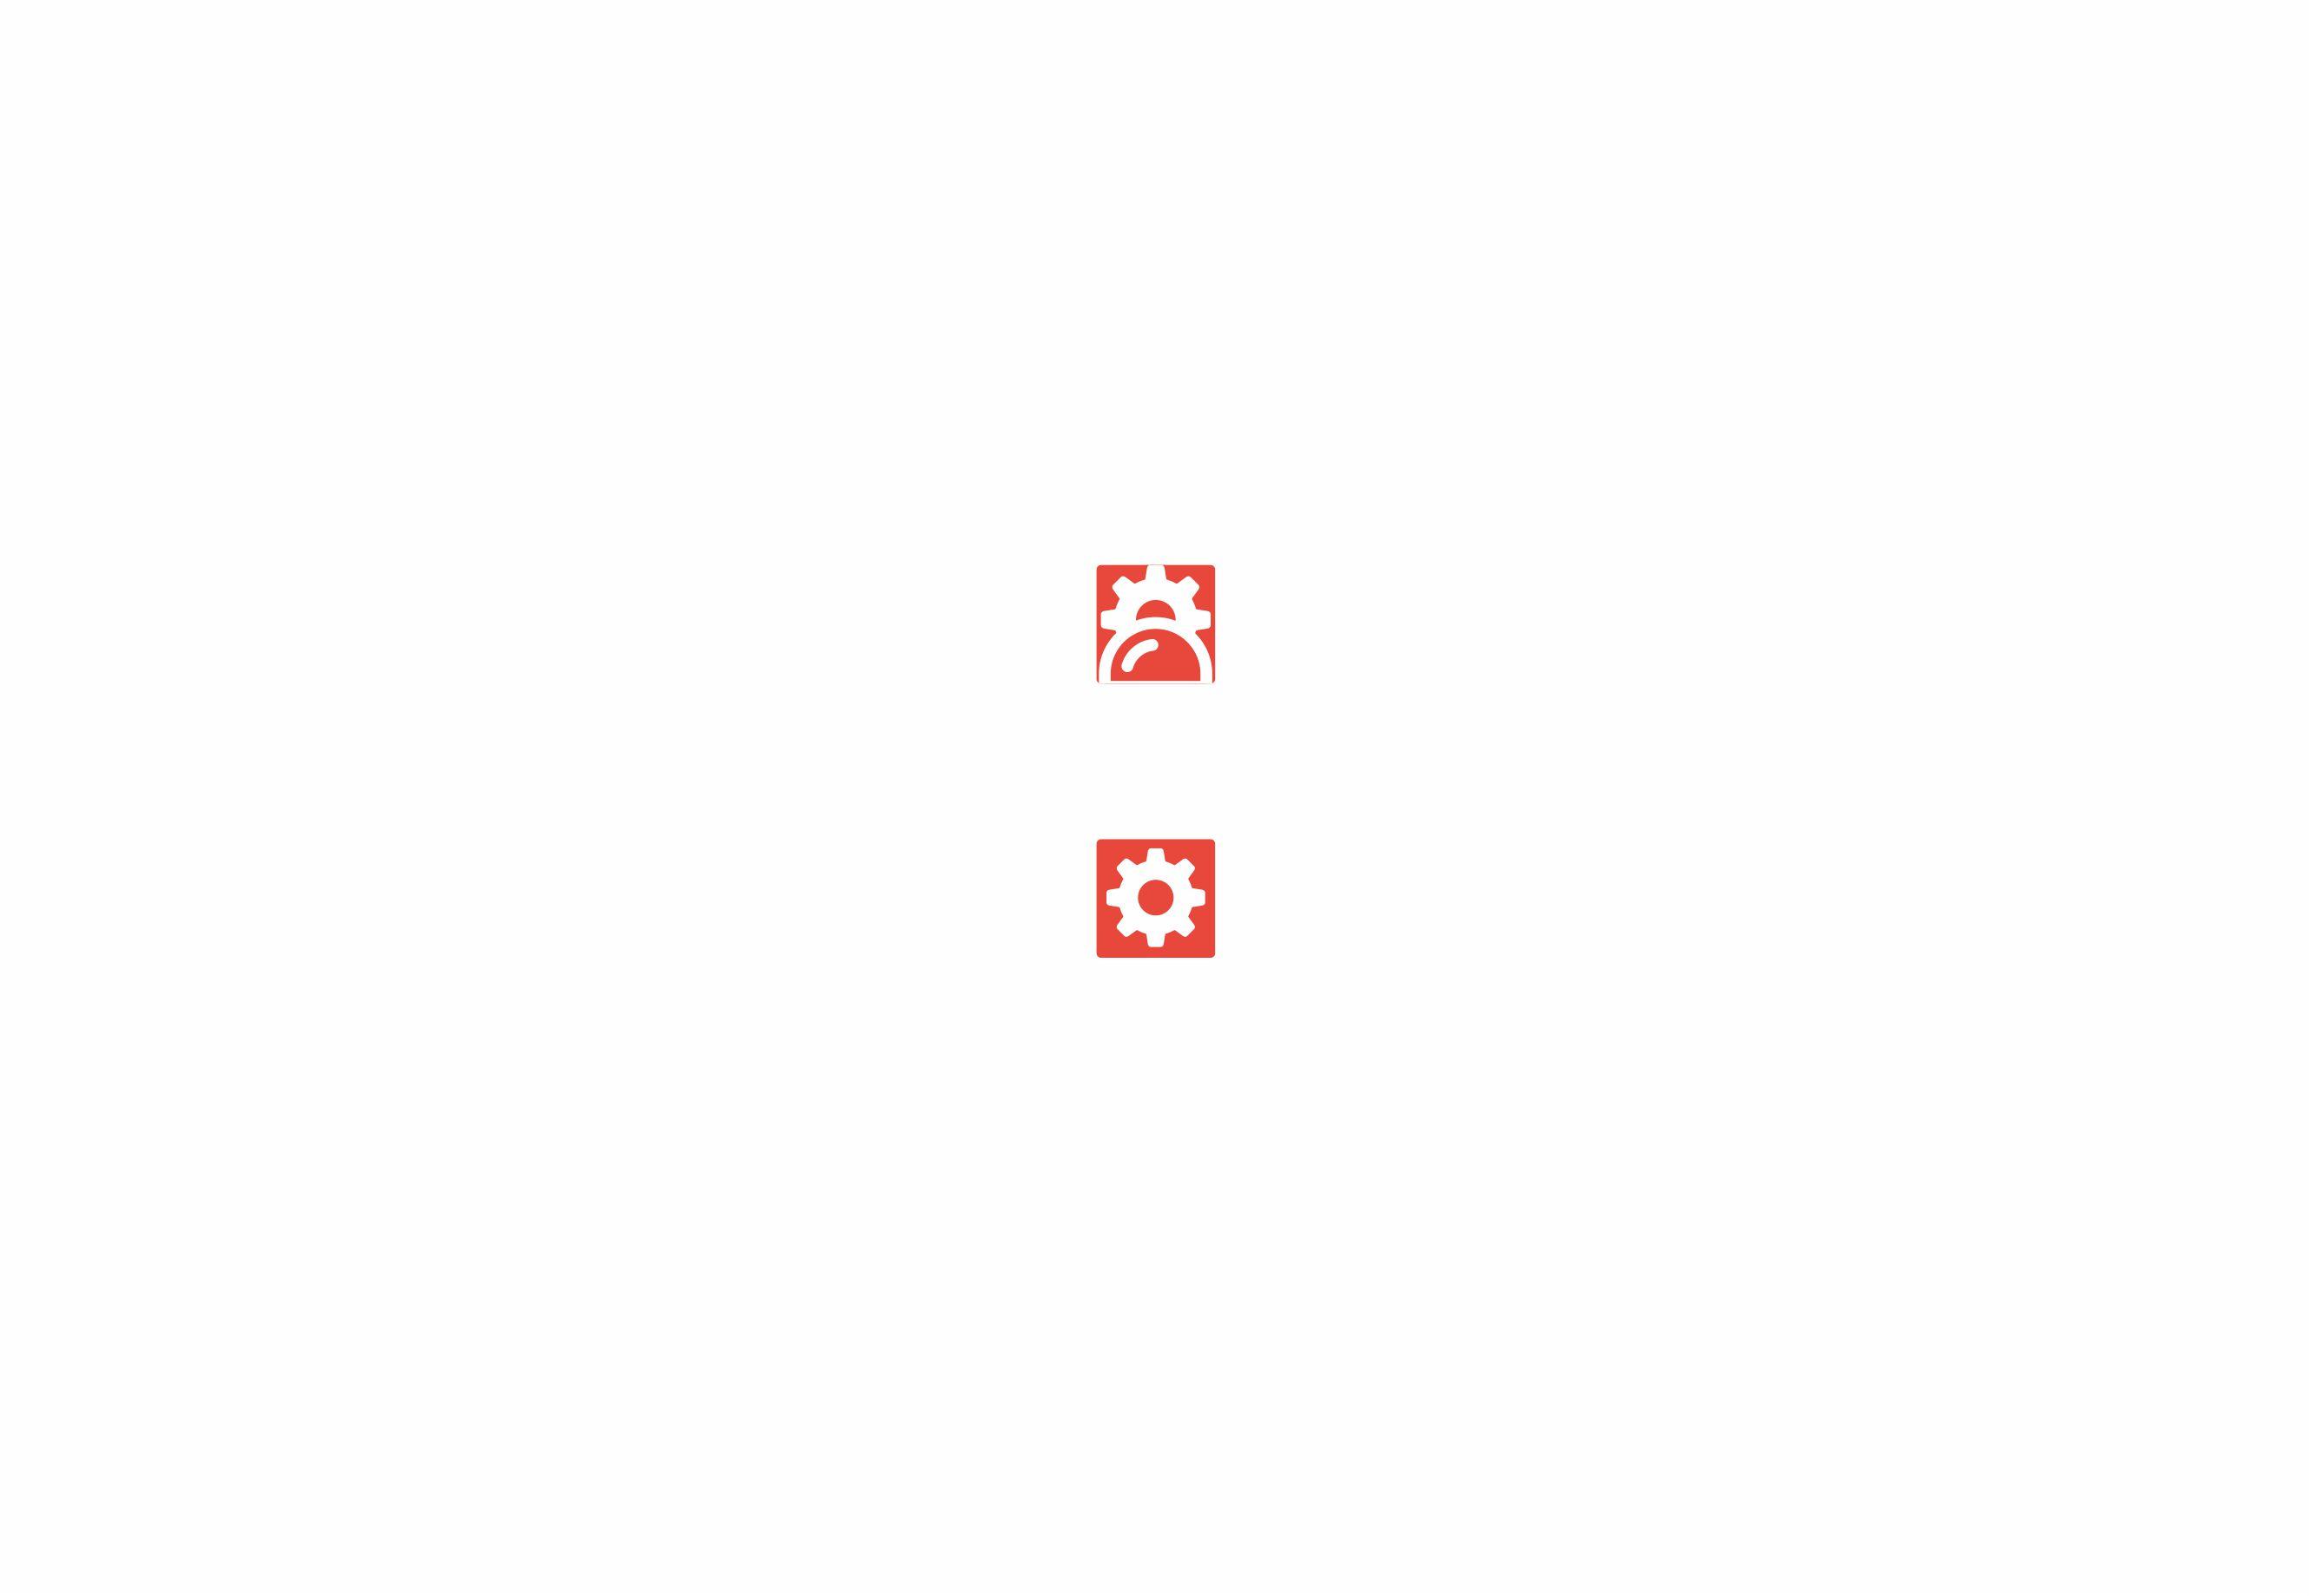 Разработать логотип и фавикон для IT- компании фото f_9055d55789abdac1.jpg